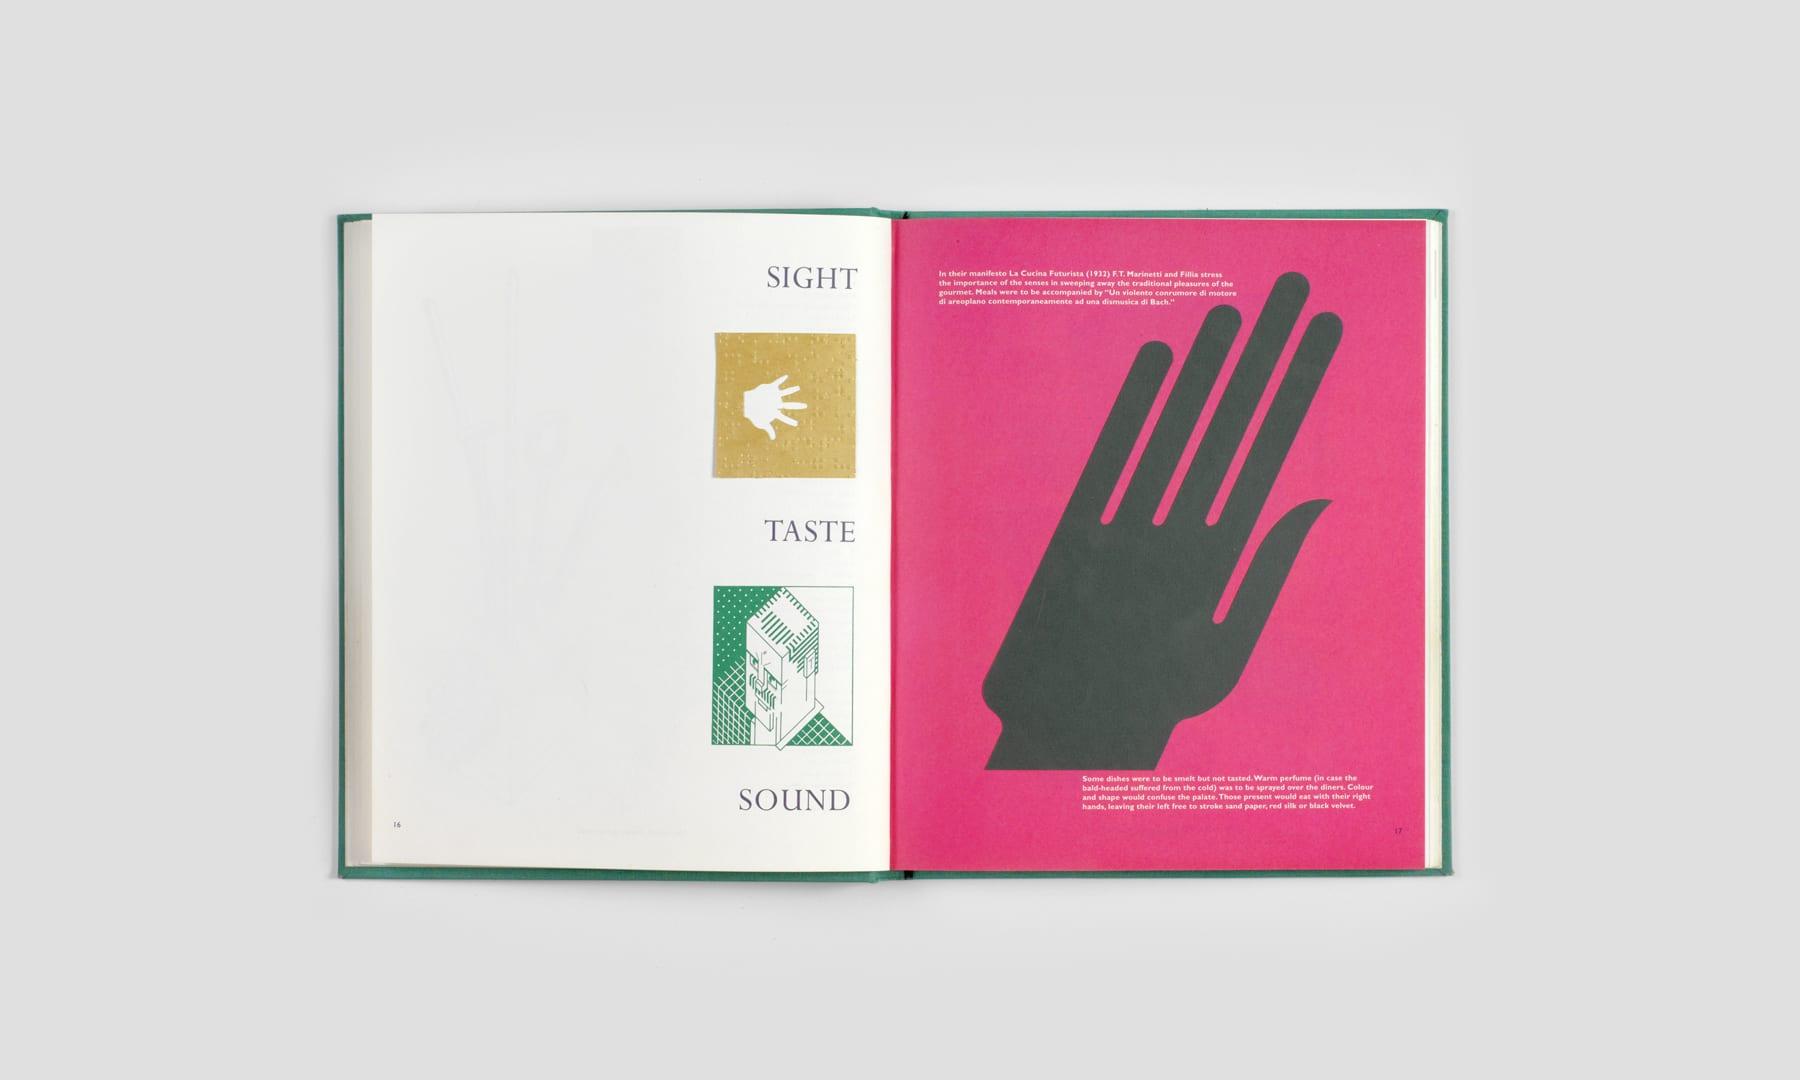 Manual - Spread 6